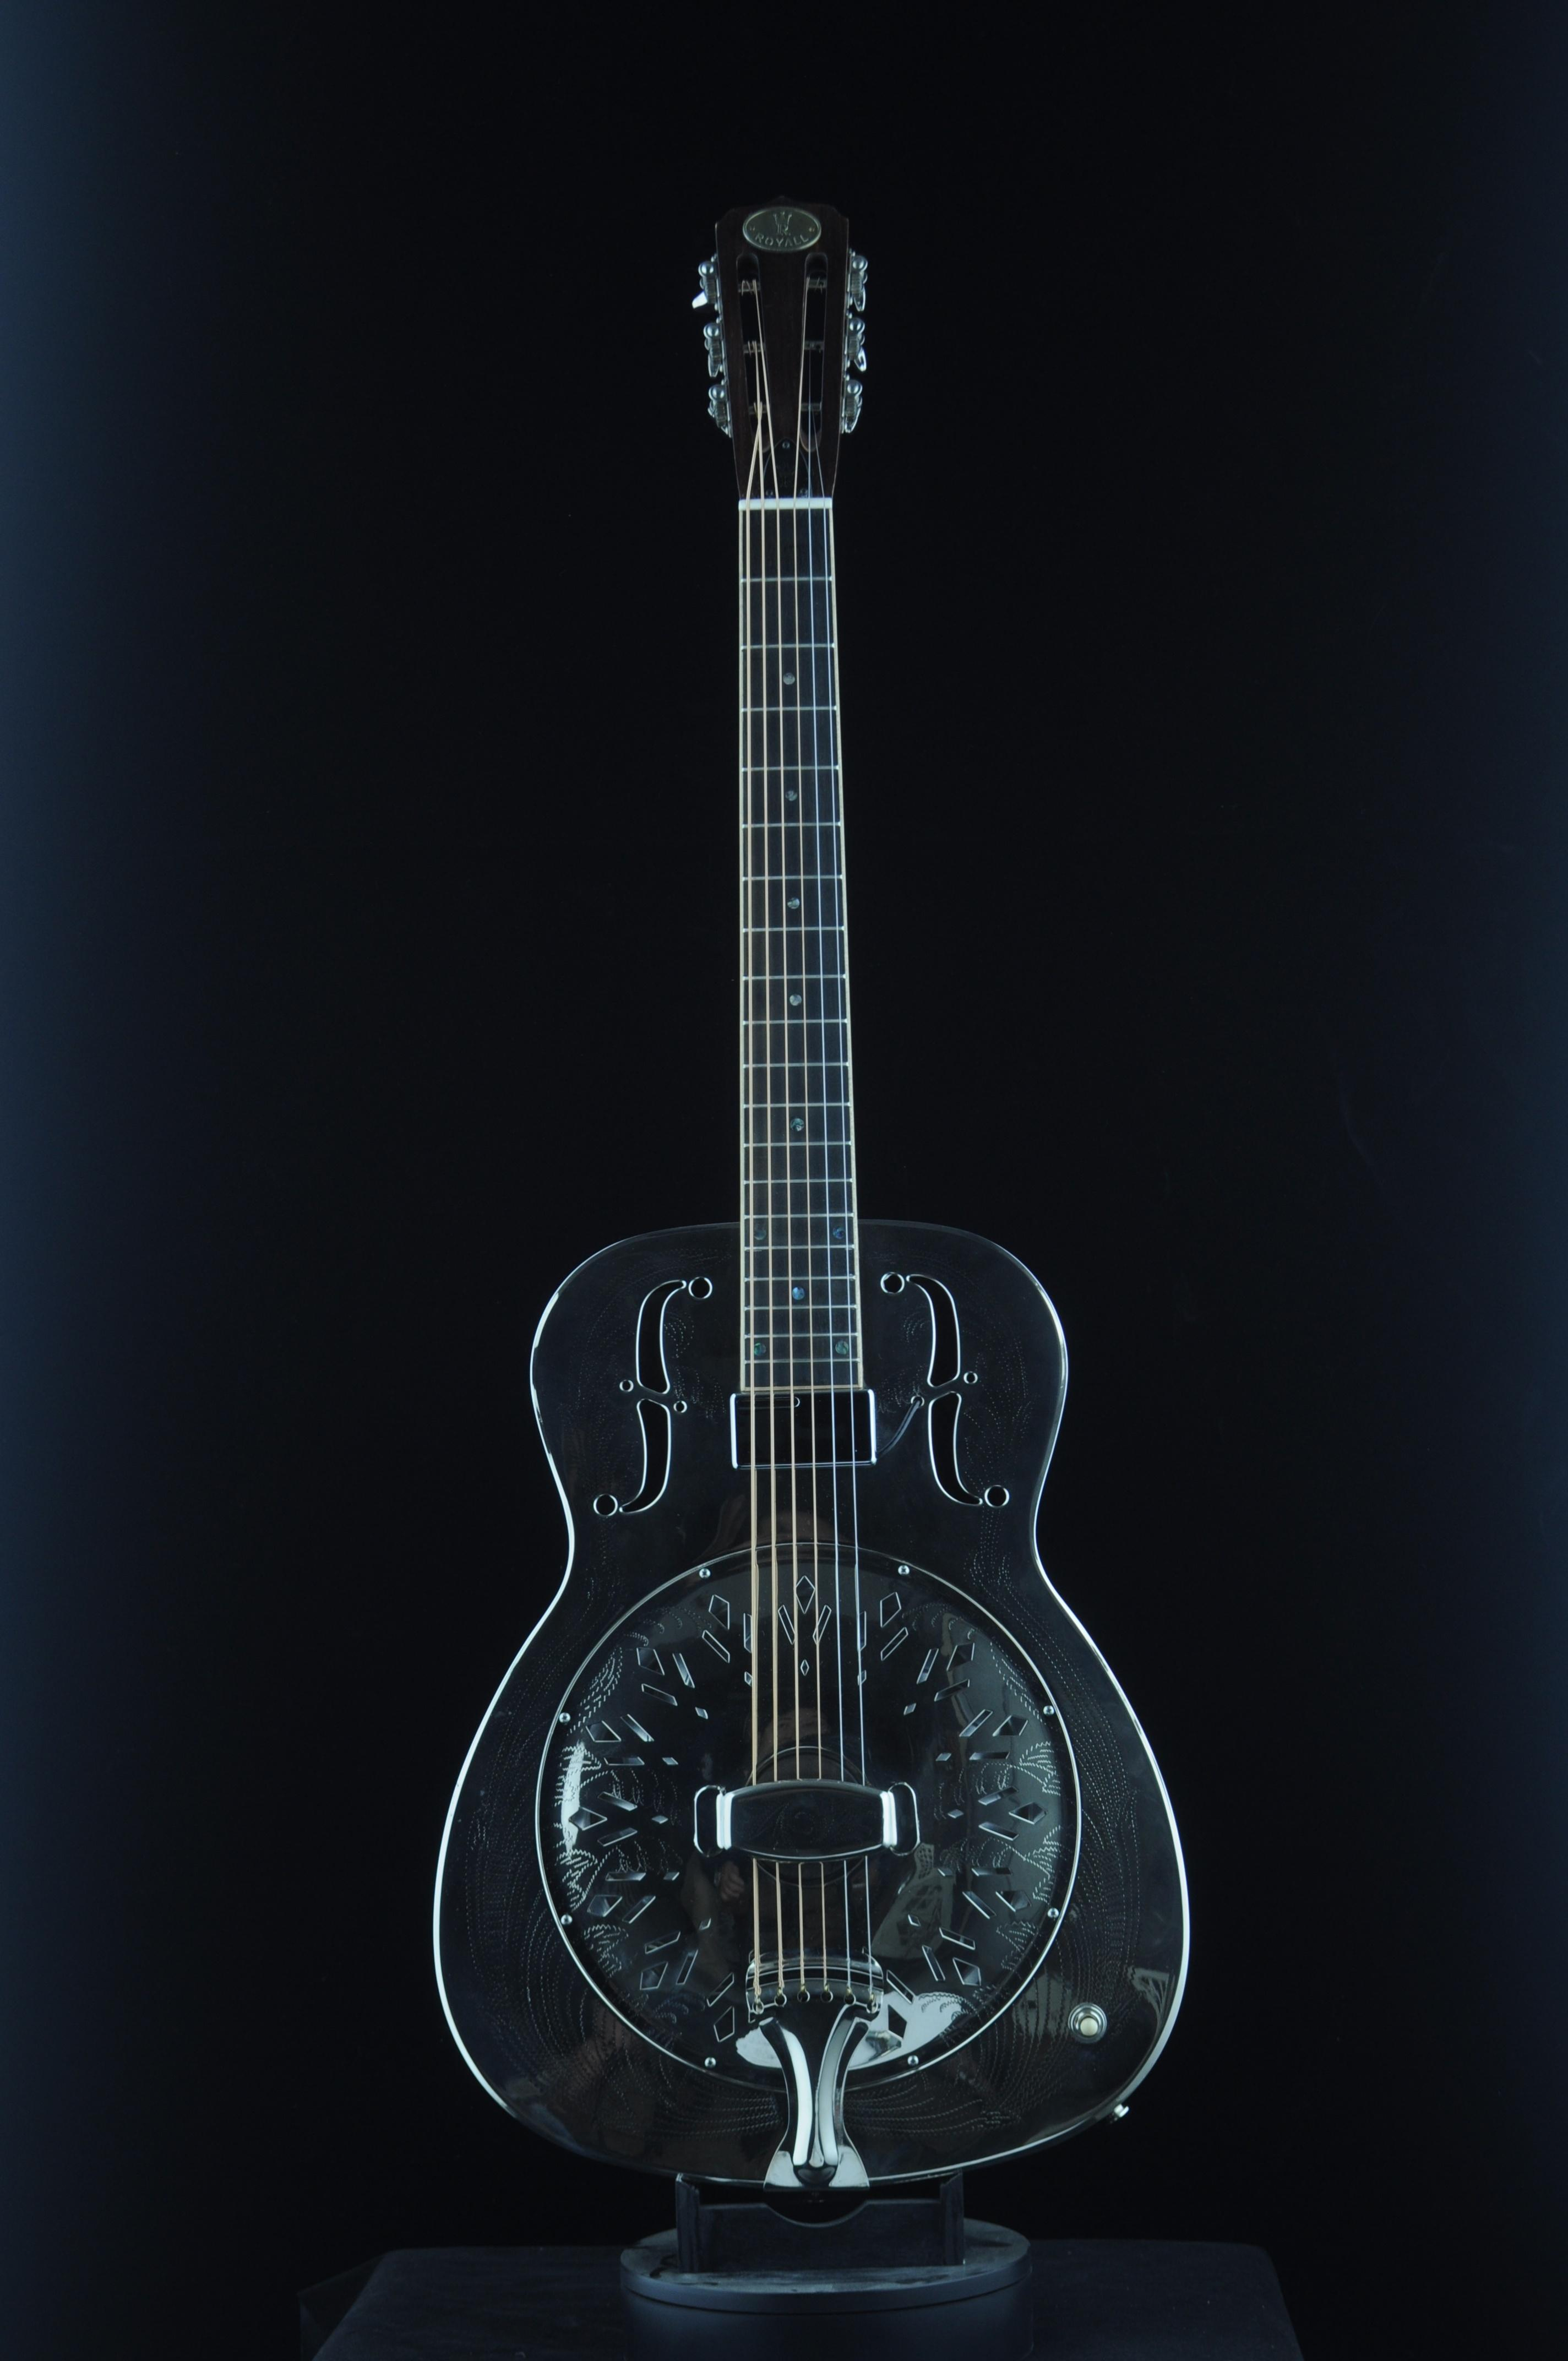 198 Nickel Engraving 雕刻